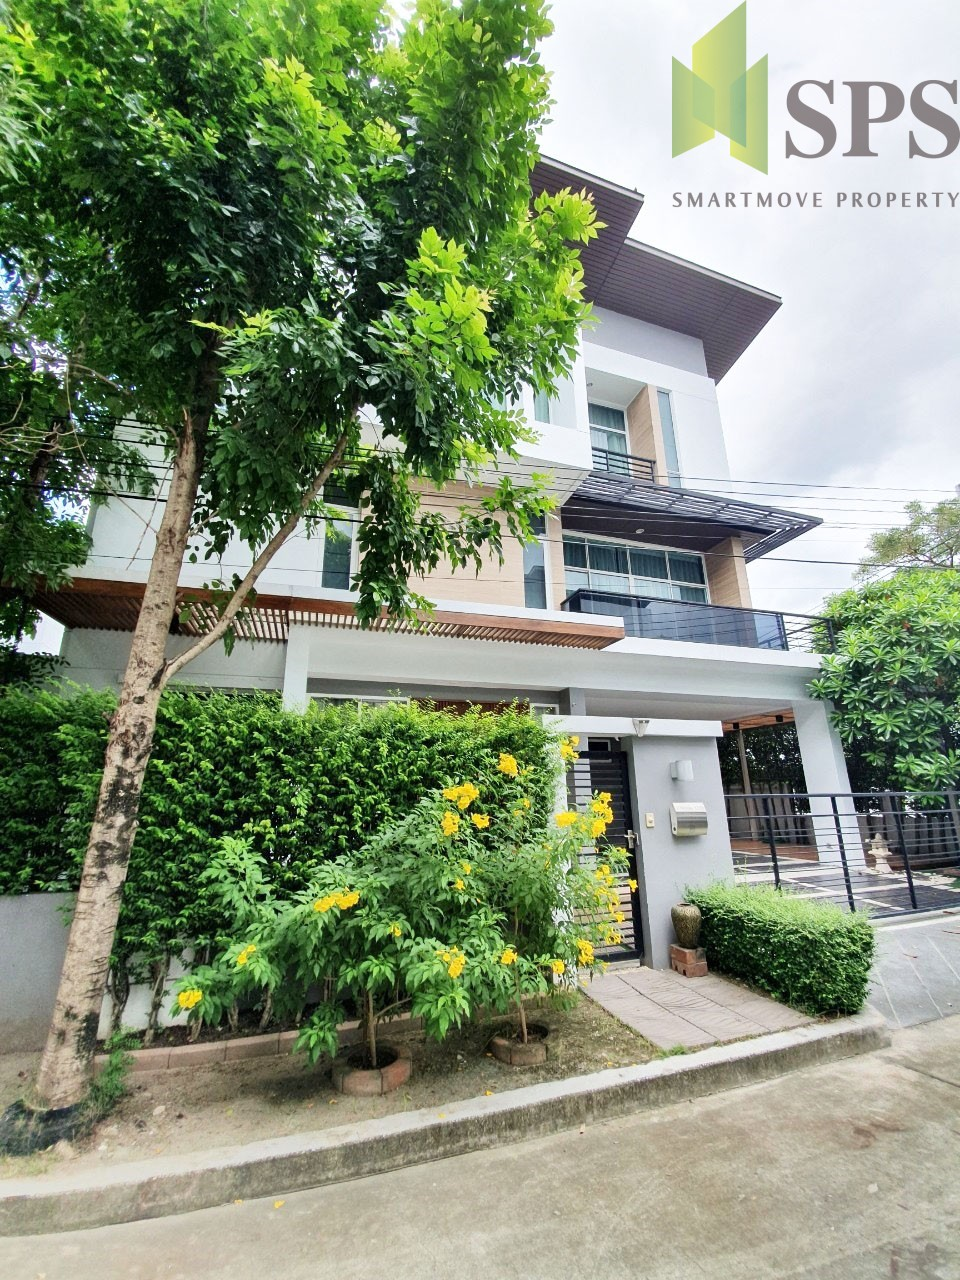 For Rent ให้เช่าบ้านเดี่ยว หมู่บ้าน Nivana Beyond lite กรุงเทพกรีฑา (Property ID: SPS-PA154)